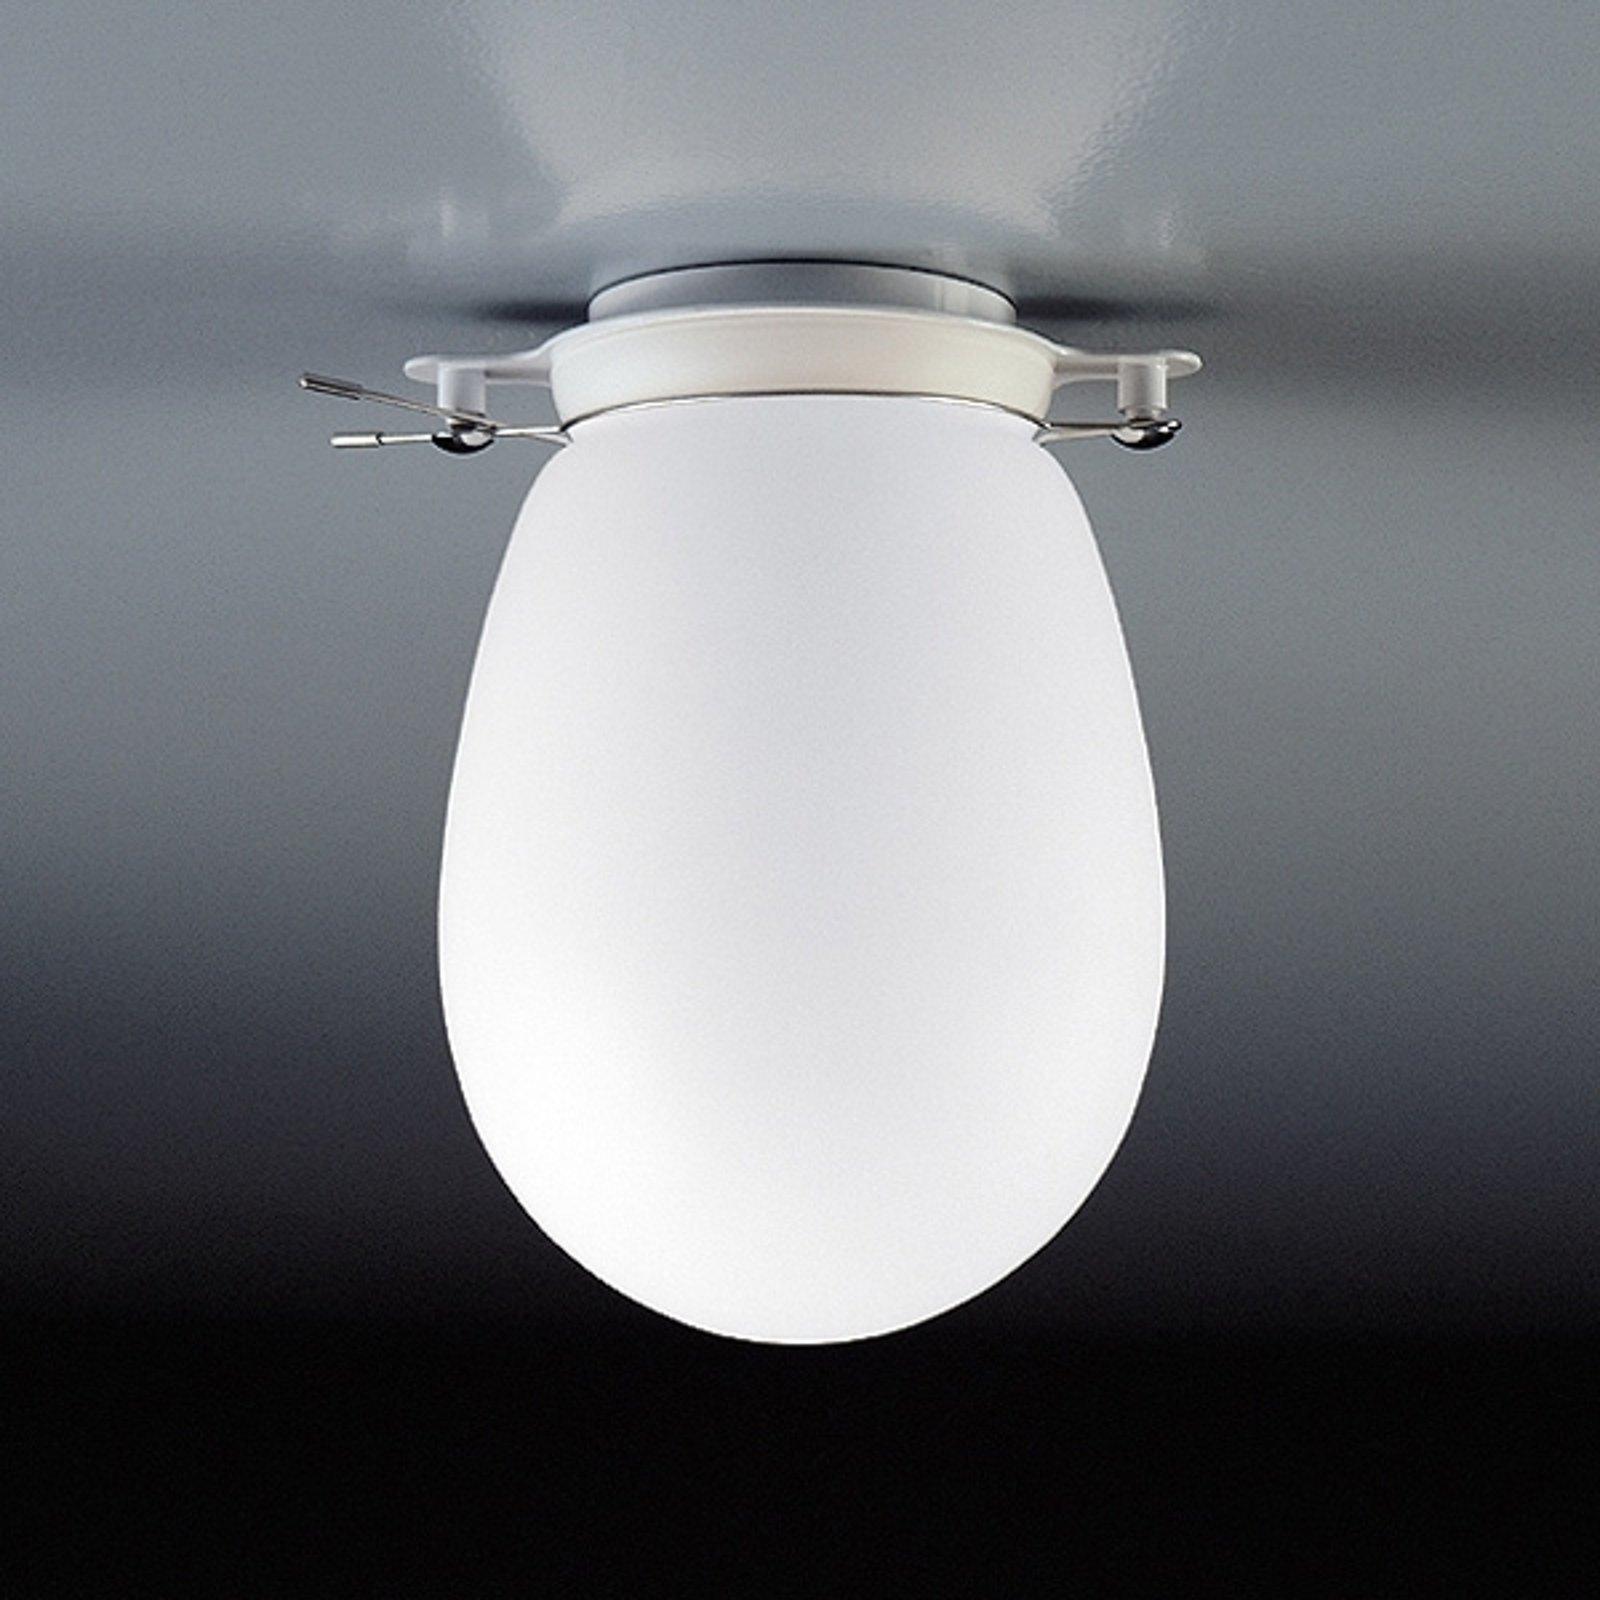 Bano taklampe med opalglass